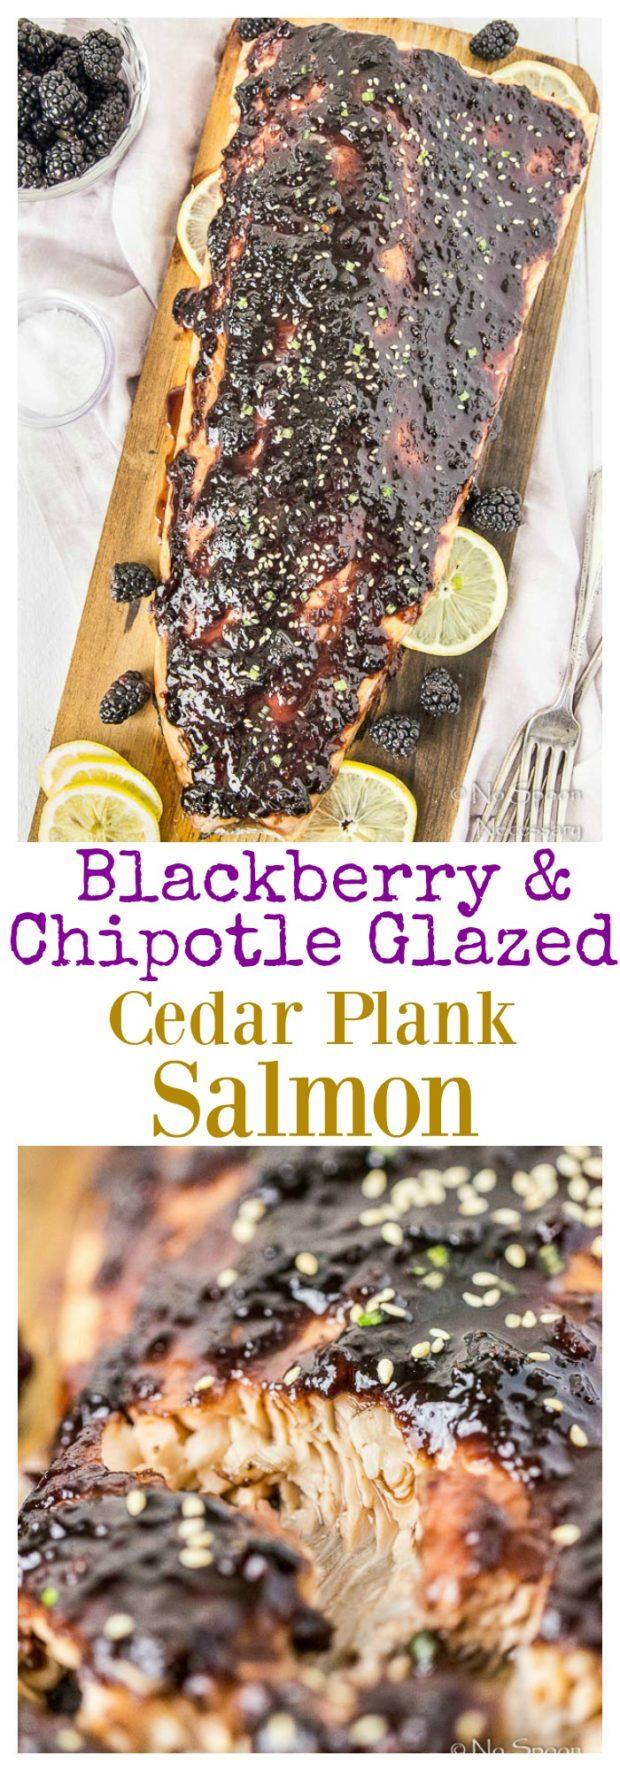 Blackberry-Chipotle Glazed Cedar Plank Salmon-long pin3